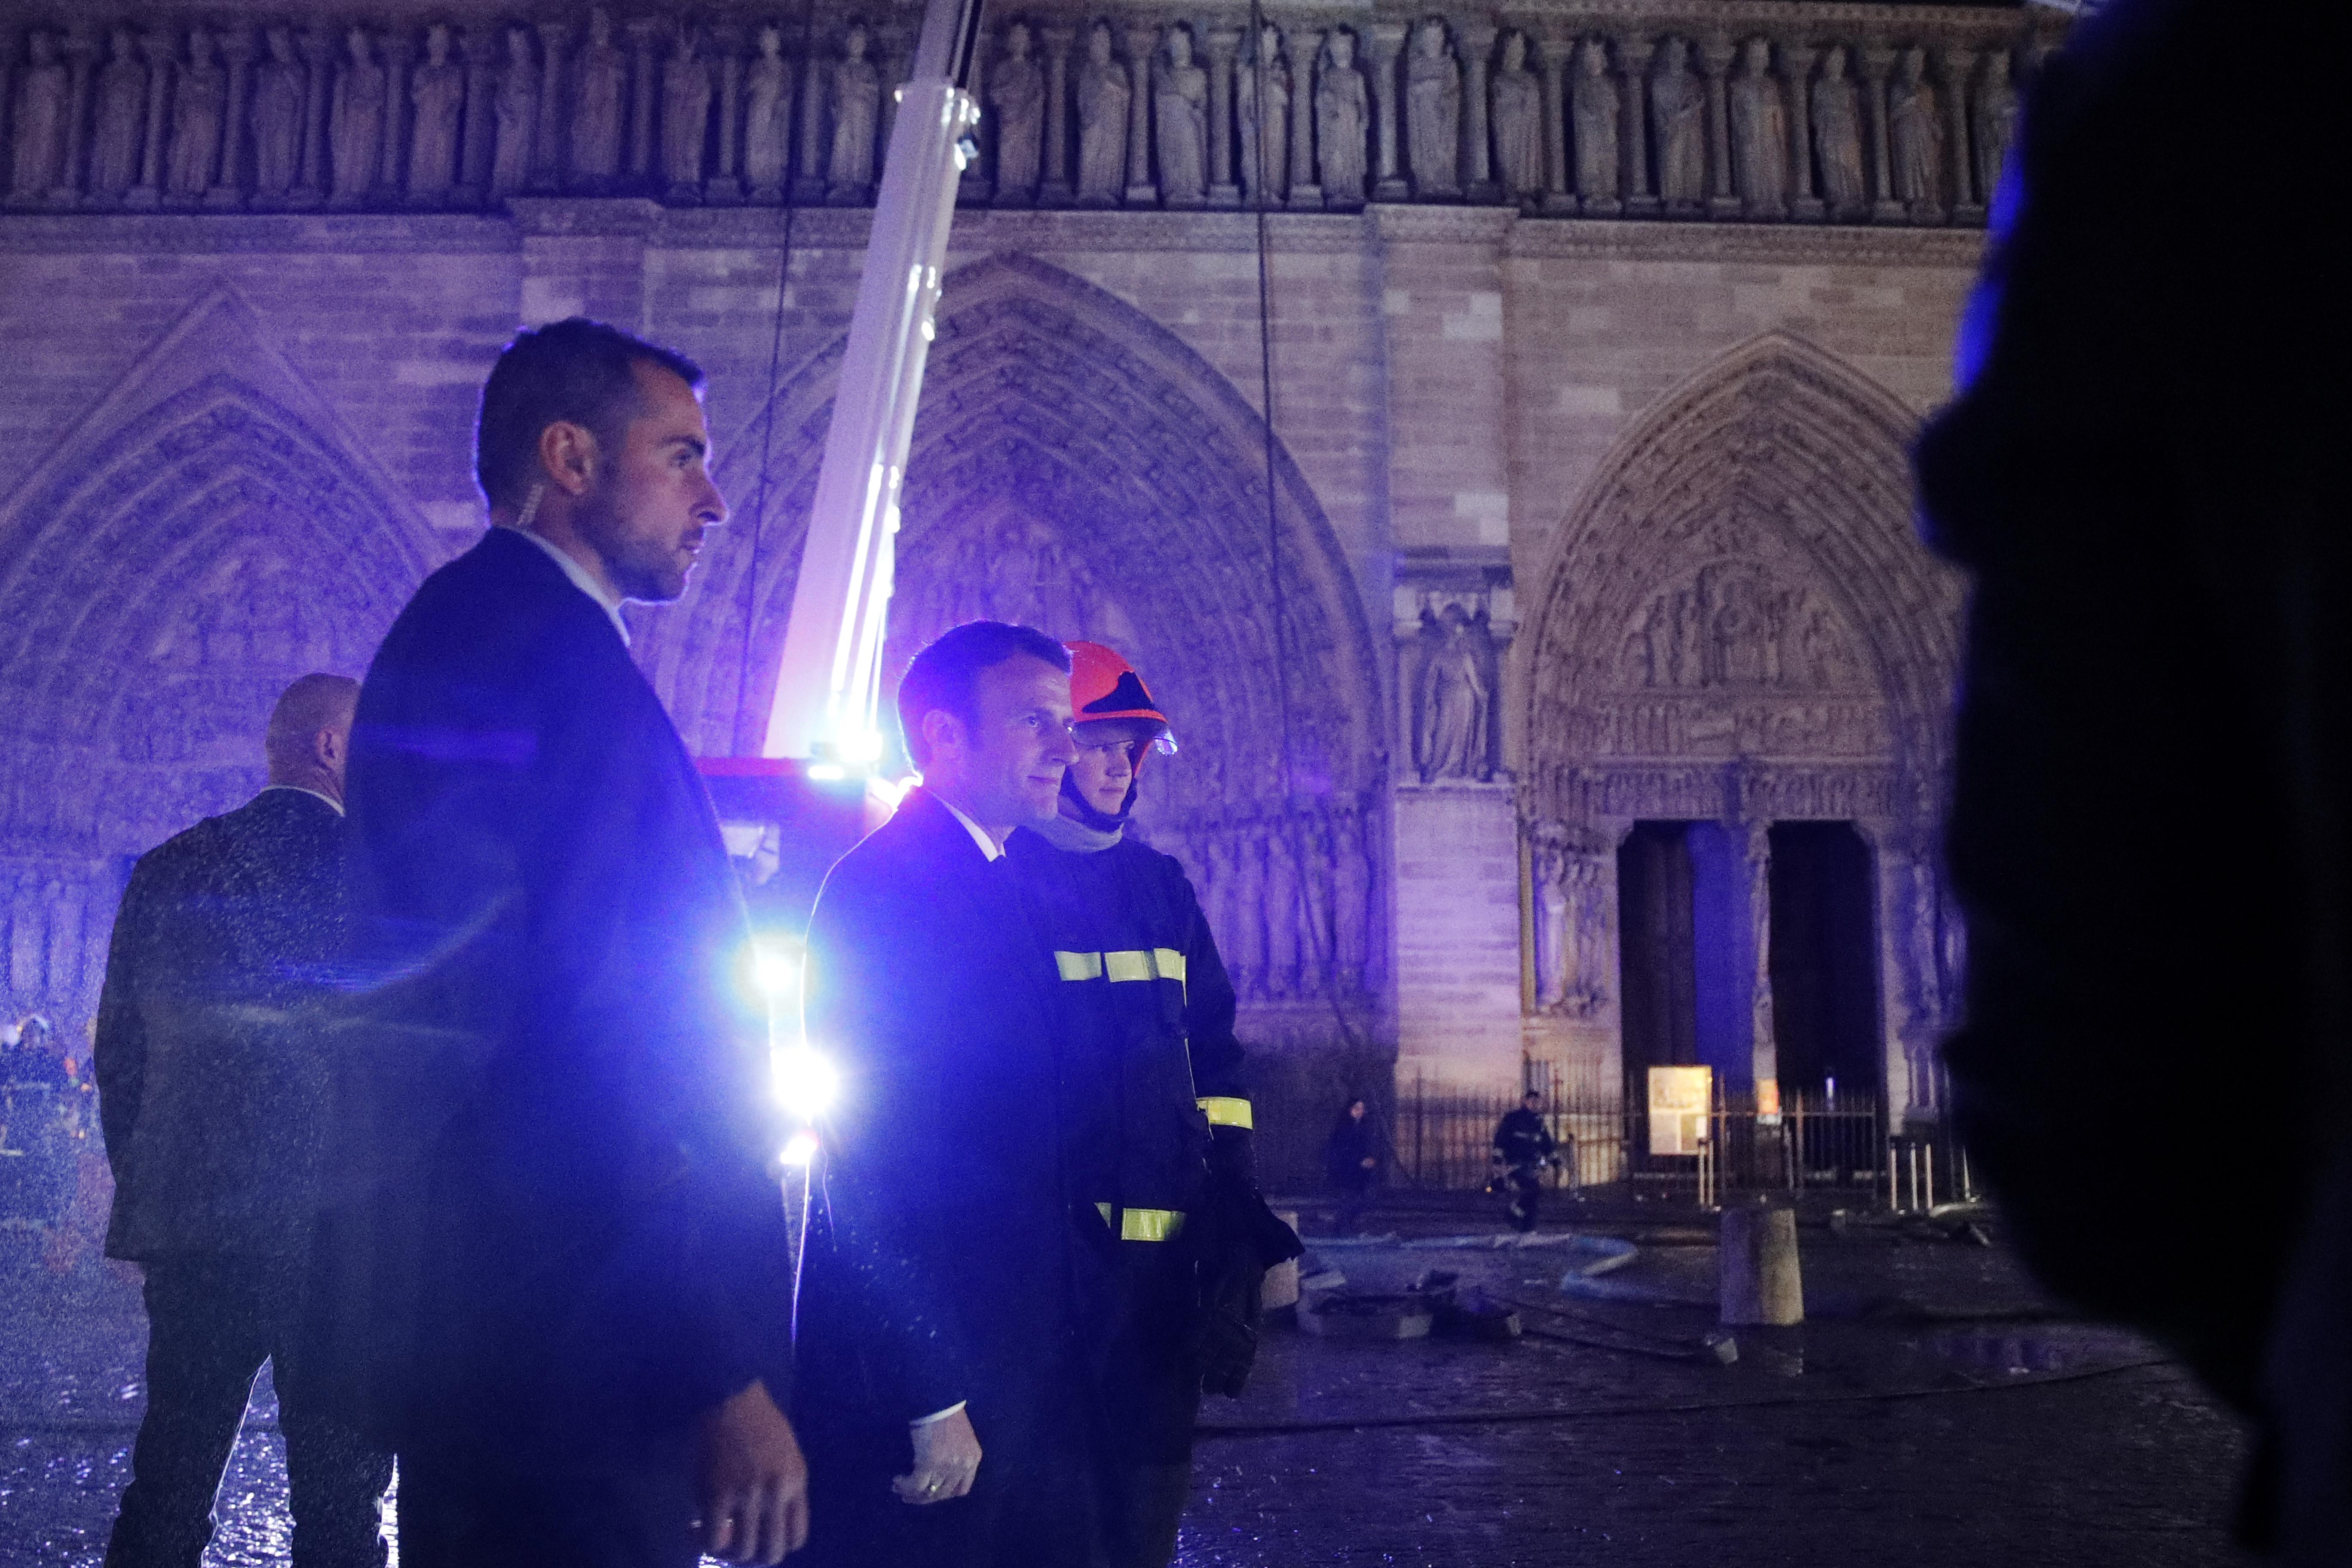 Пожар в Нотр-Даме частично погасили: что удалось спасти - фото